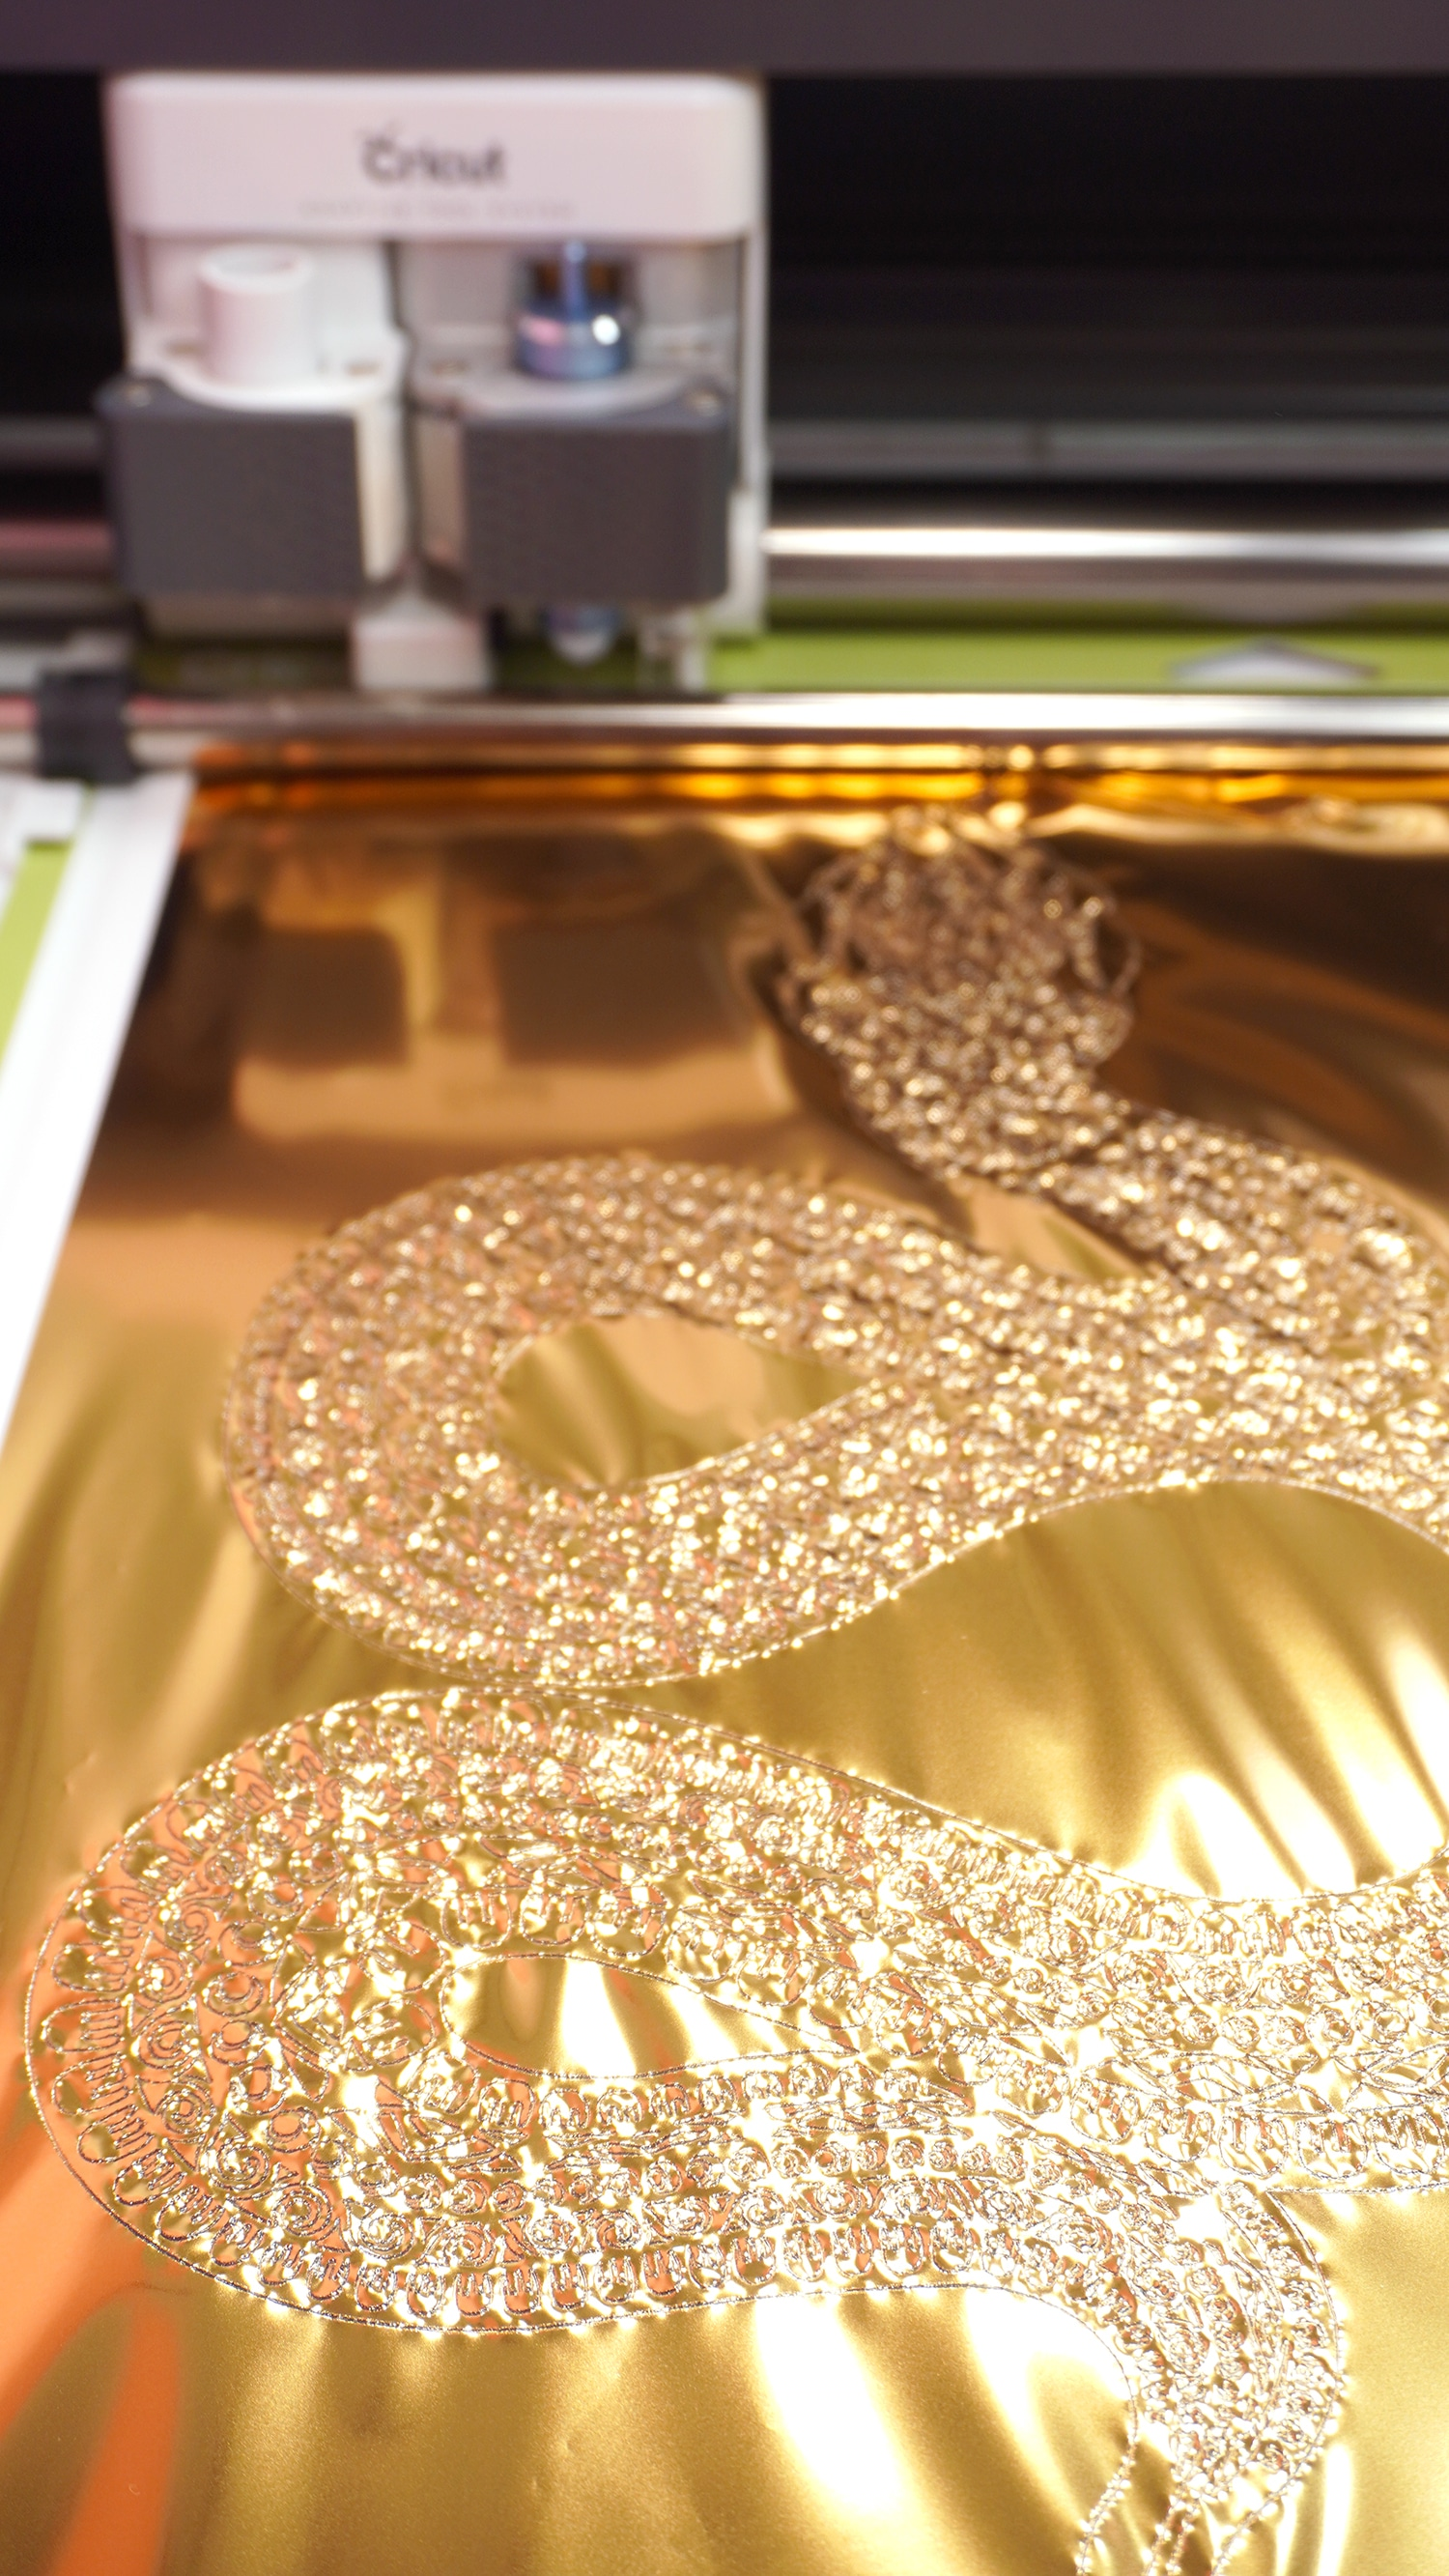 Close up of gold foil transfer sheet with snake design